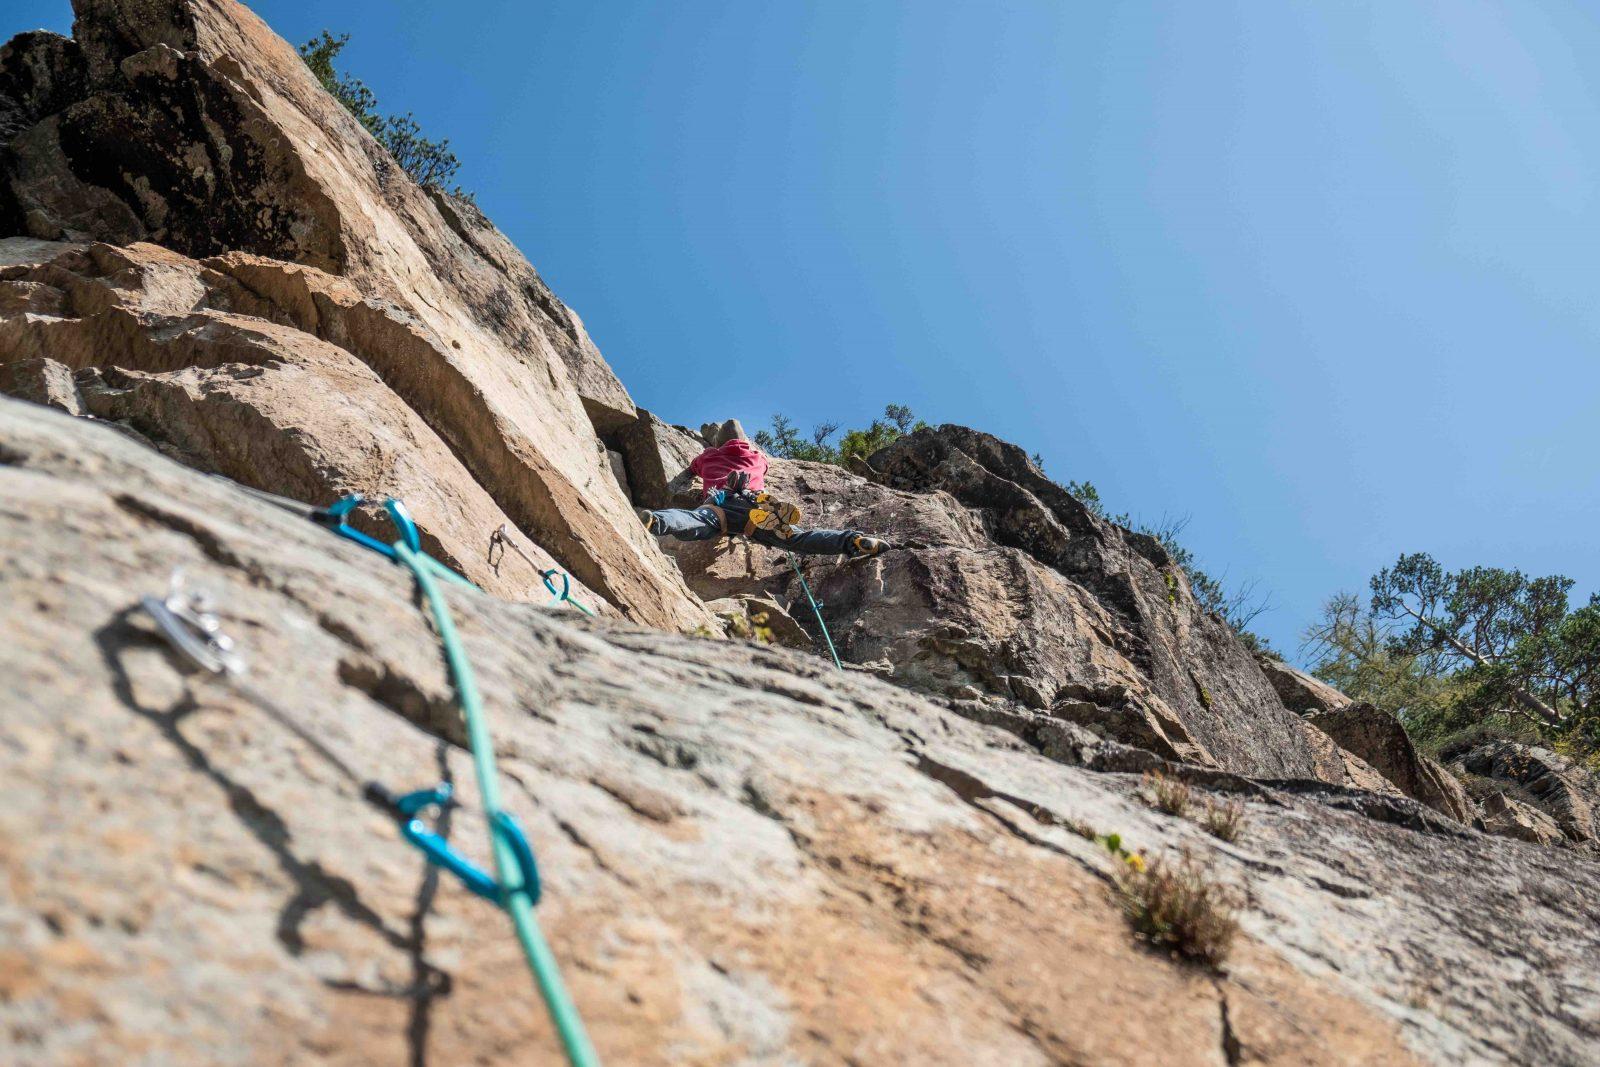 Last minute Klettertrainin, Am Felsen, Foto: Benjamin Zörer |Climbers Paradise